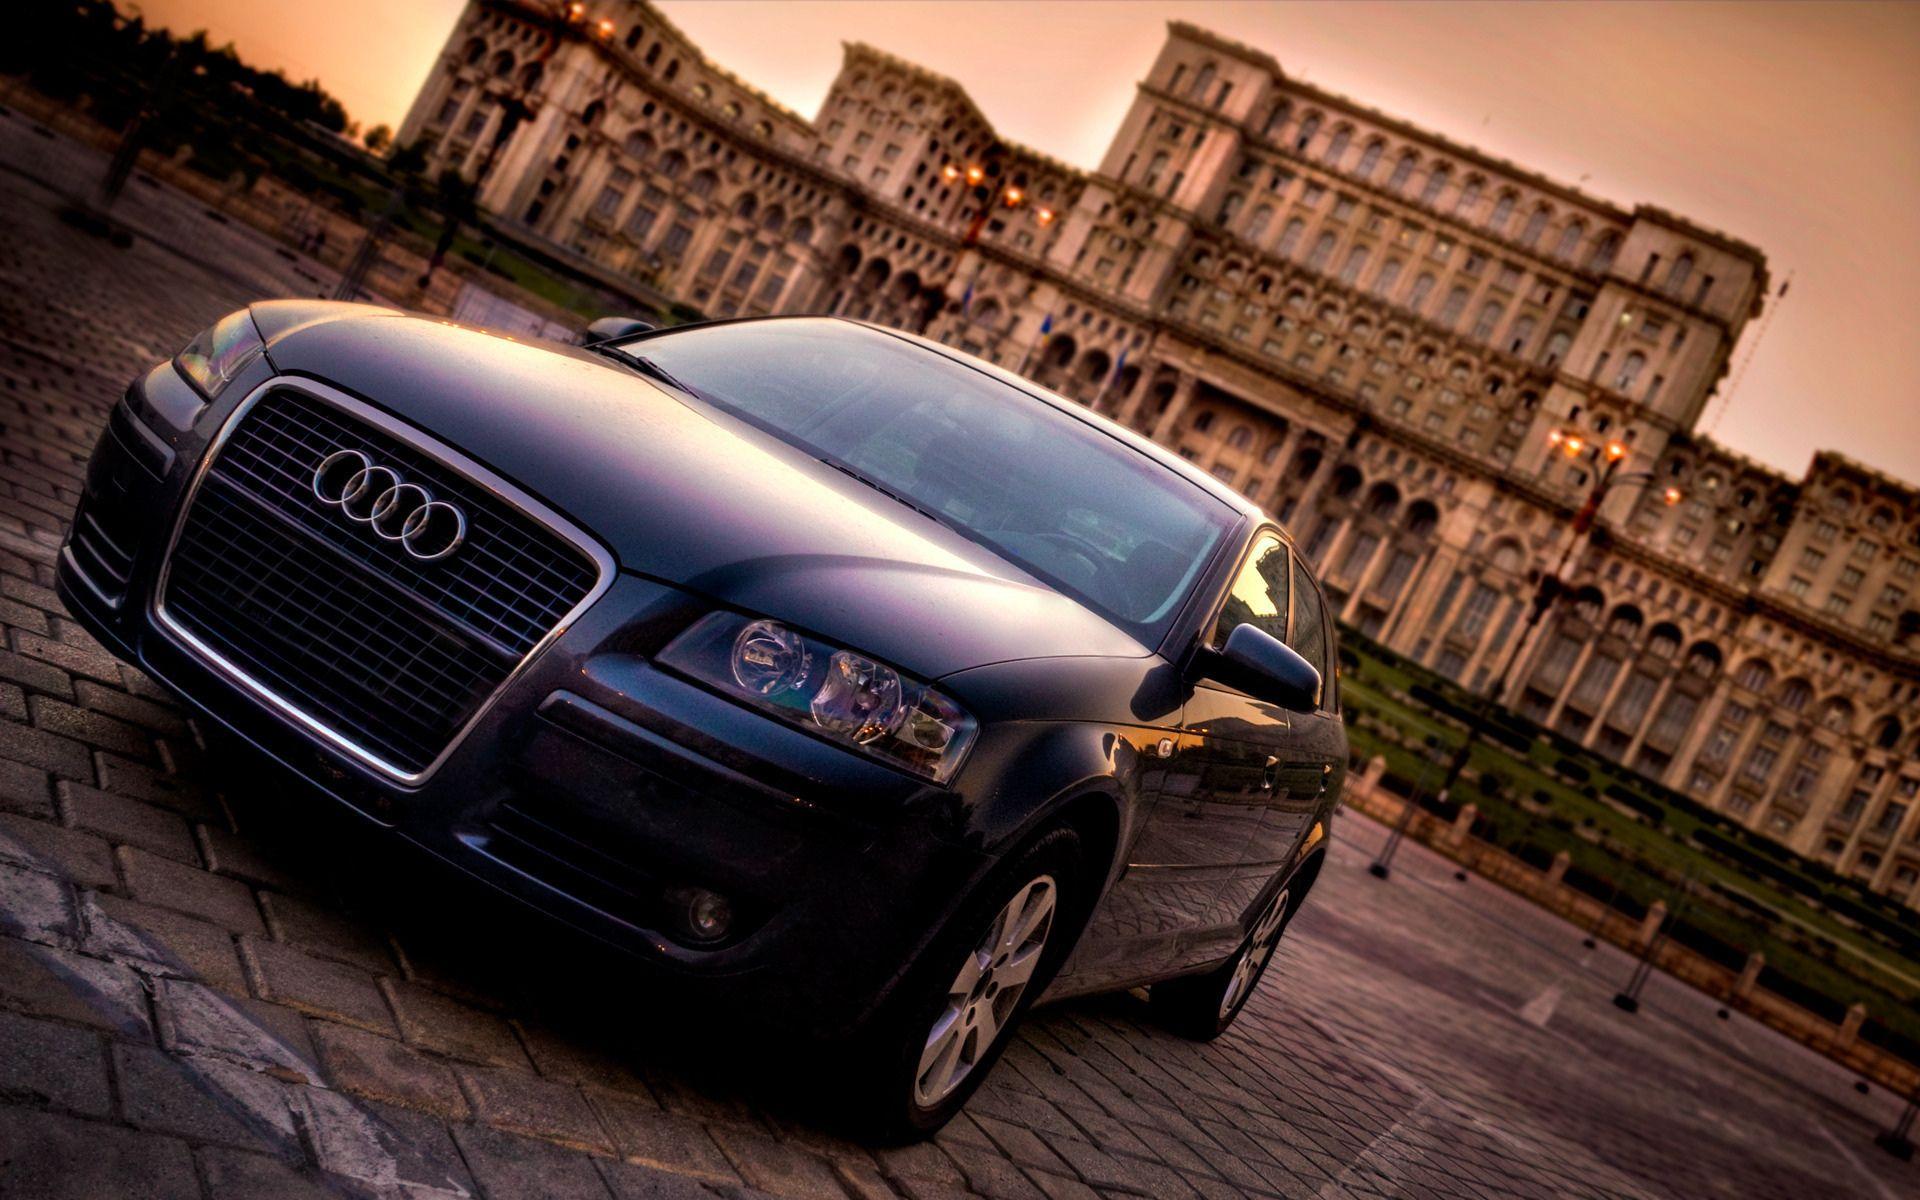 Audi Beautiful Pictures